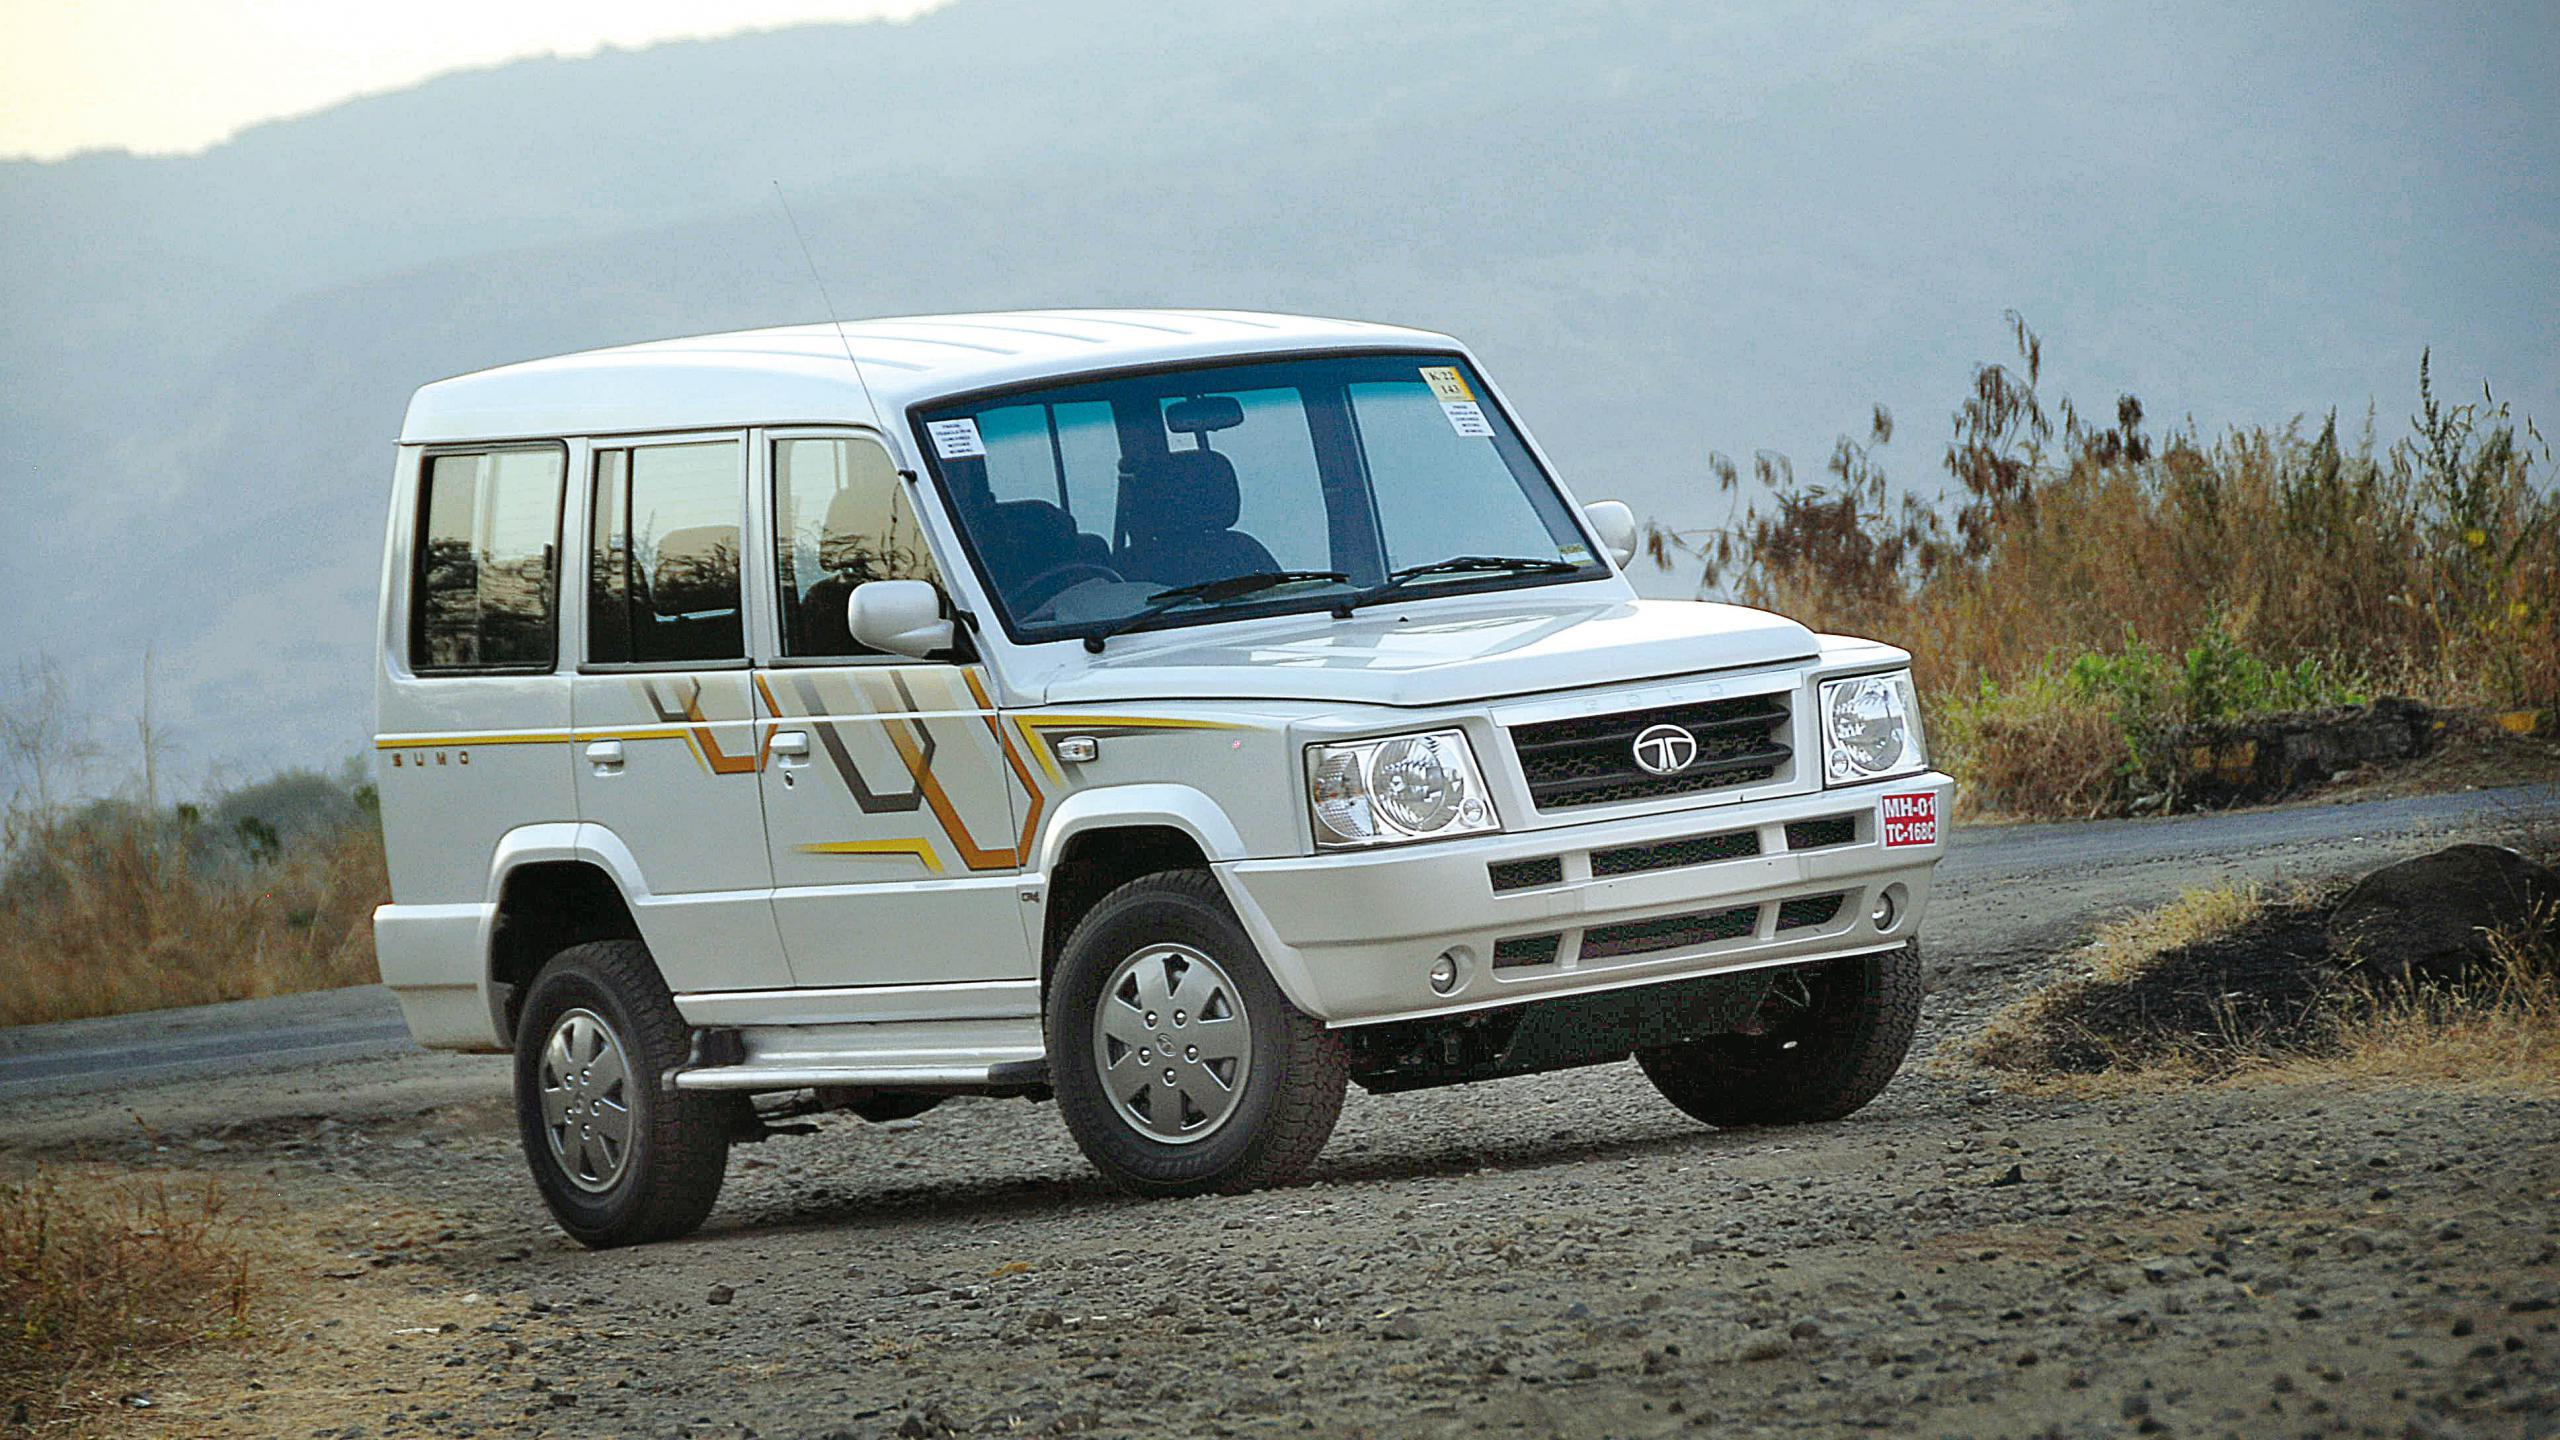 10 Indian Cars 10 Amazing Facts Aanavandi Travel Blog